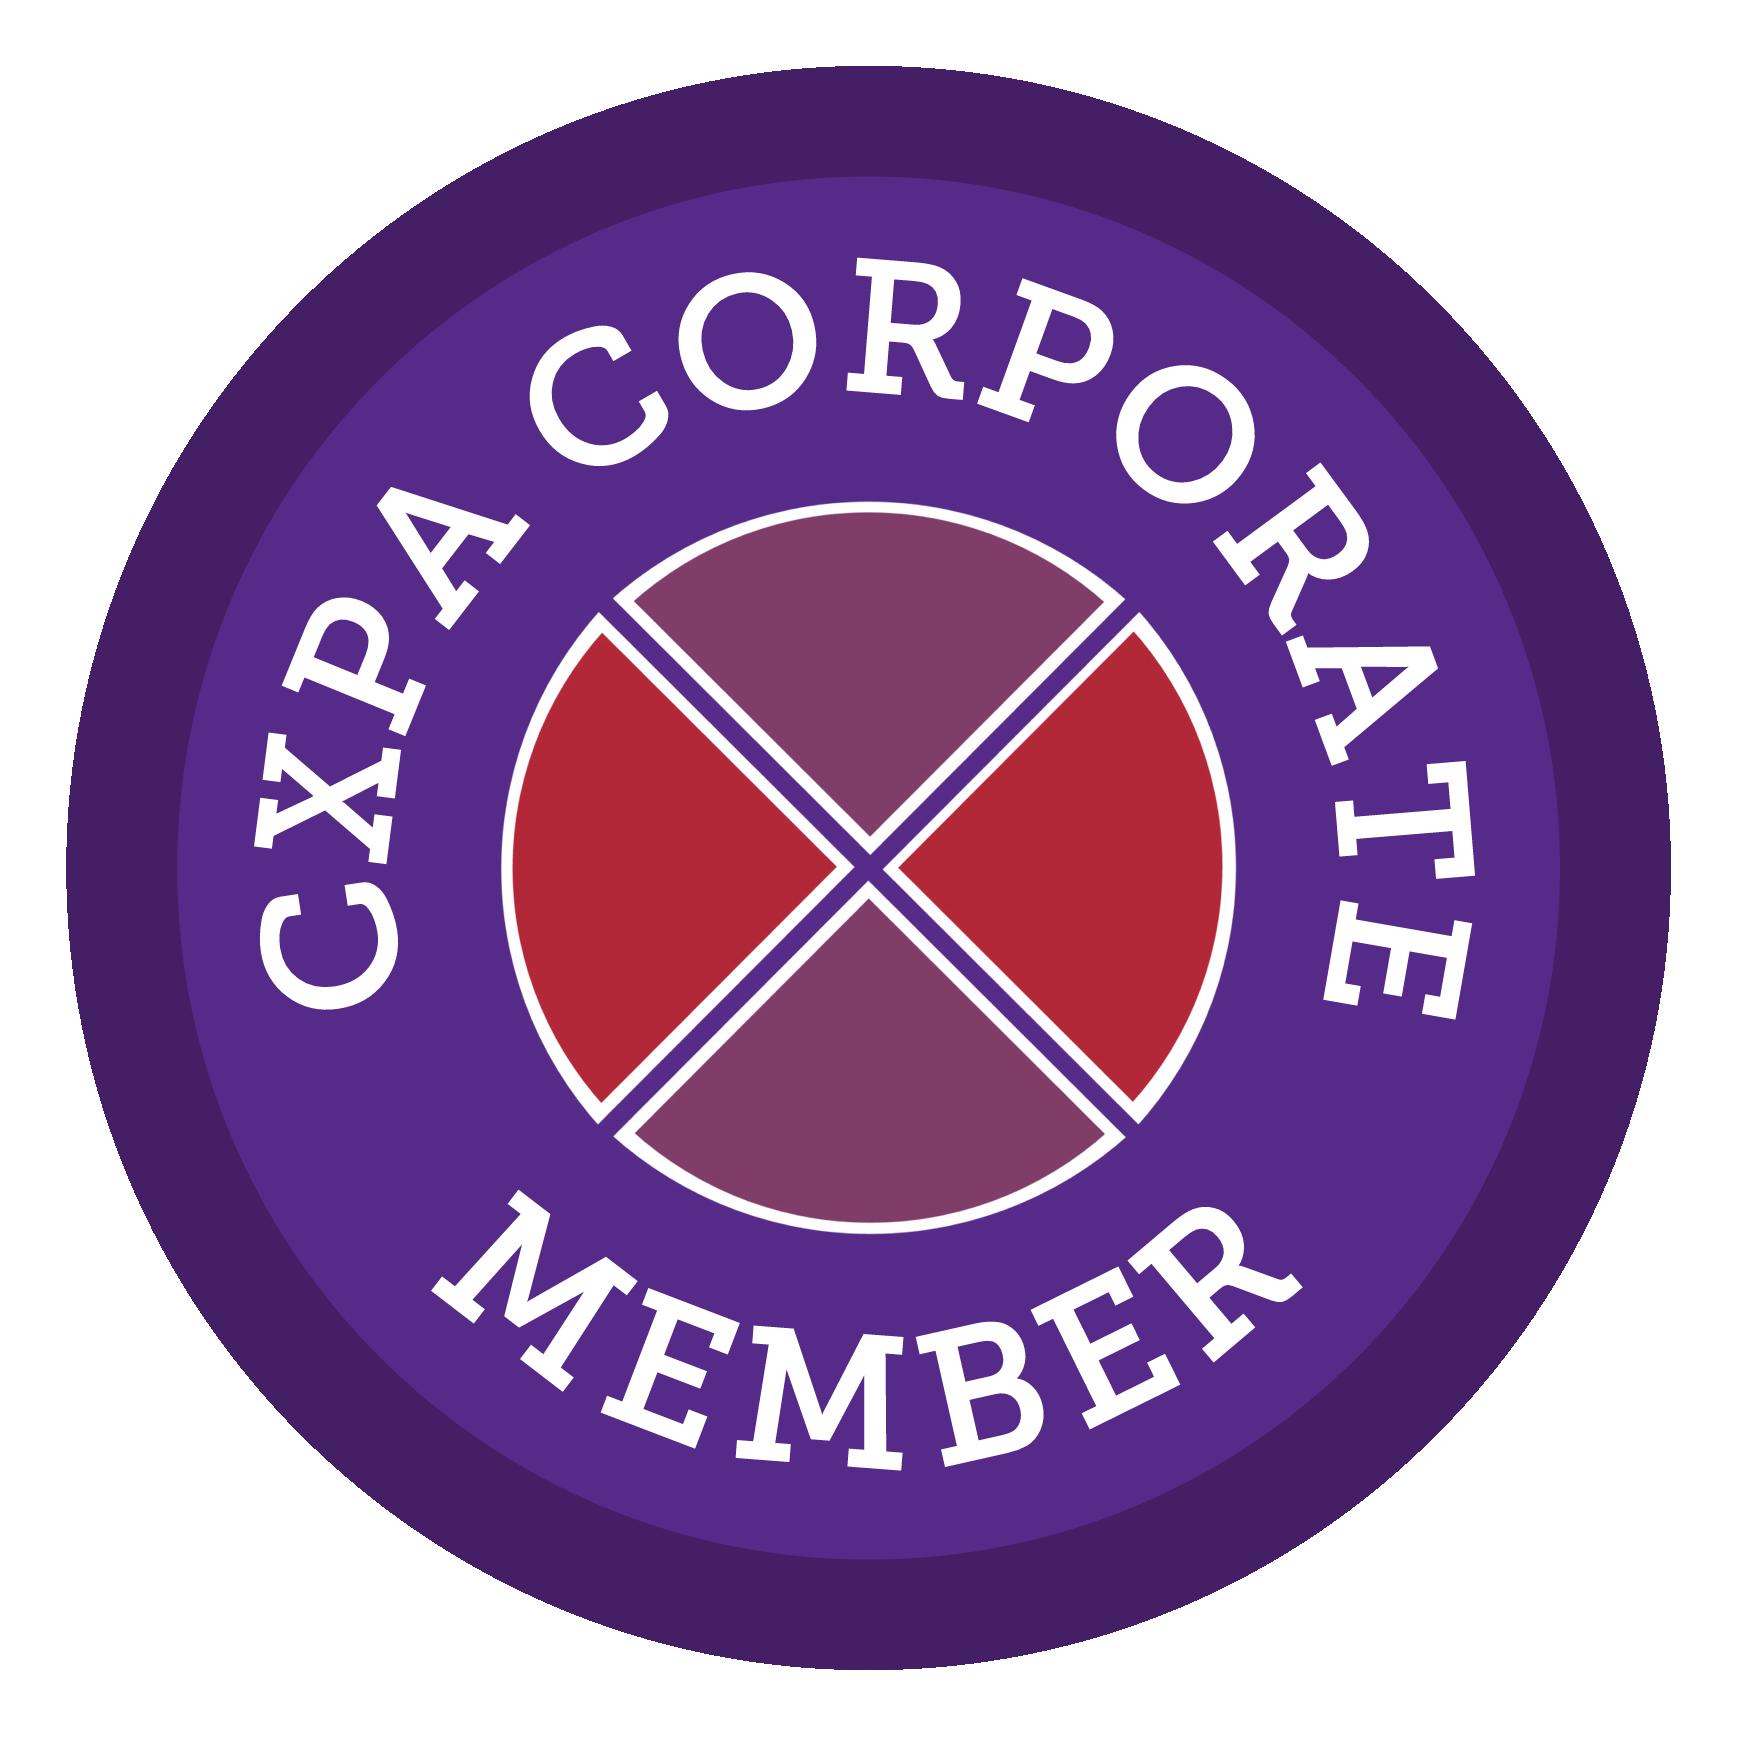 CXPA Corporate Member - Ruby Logo